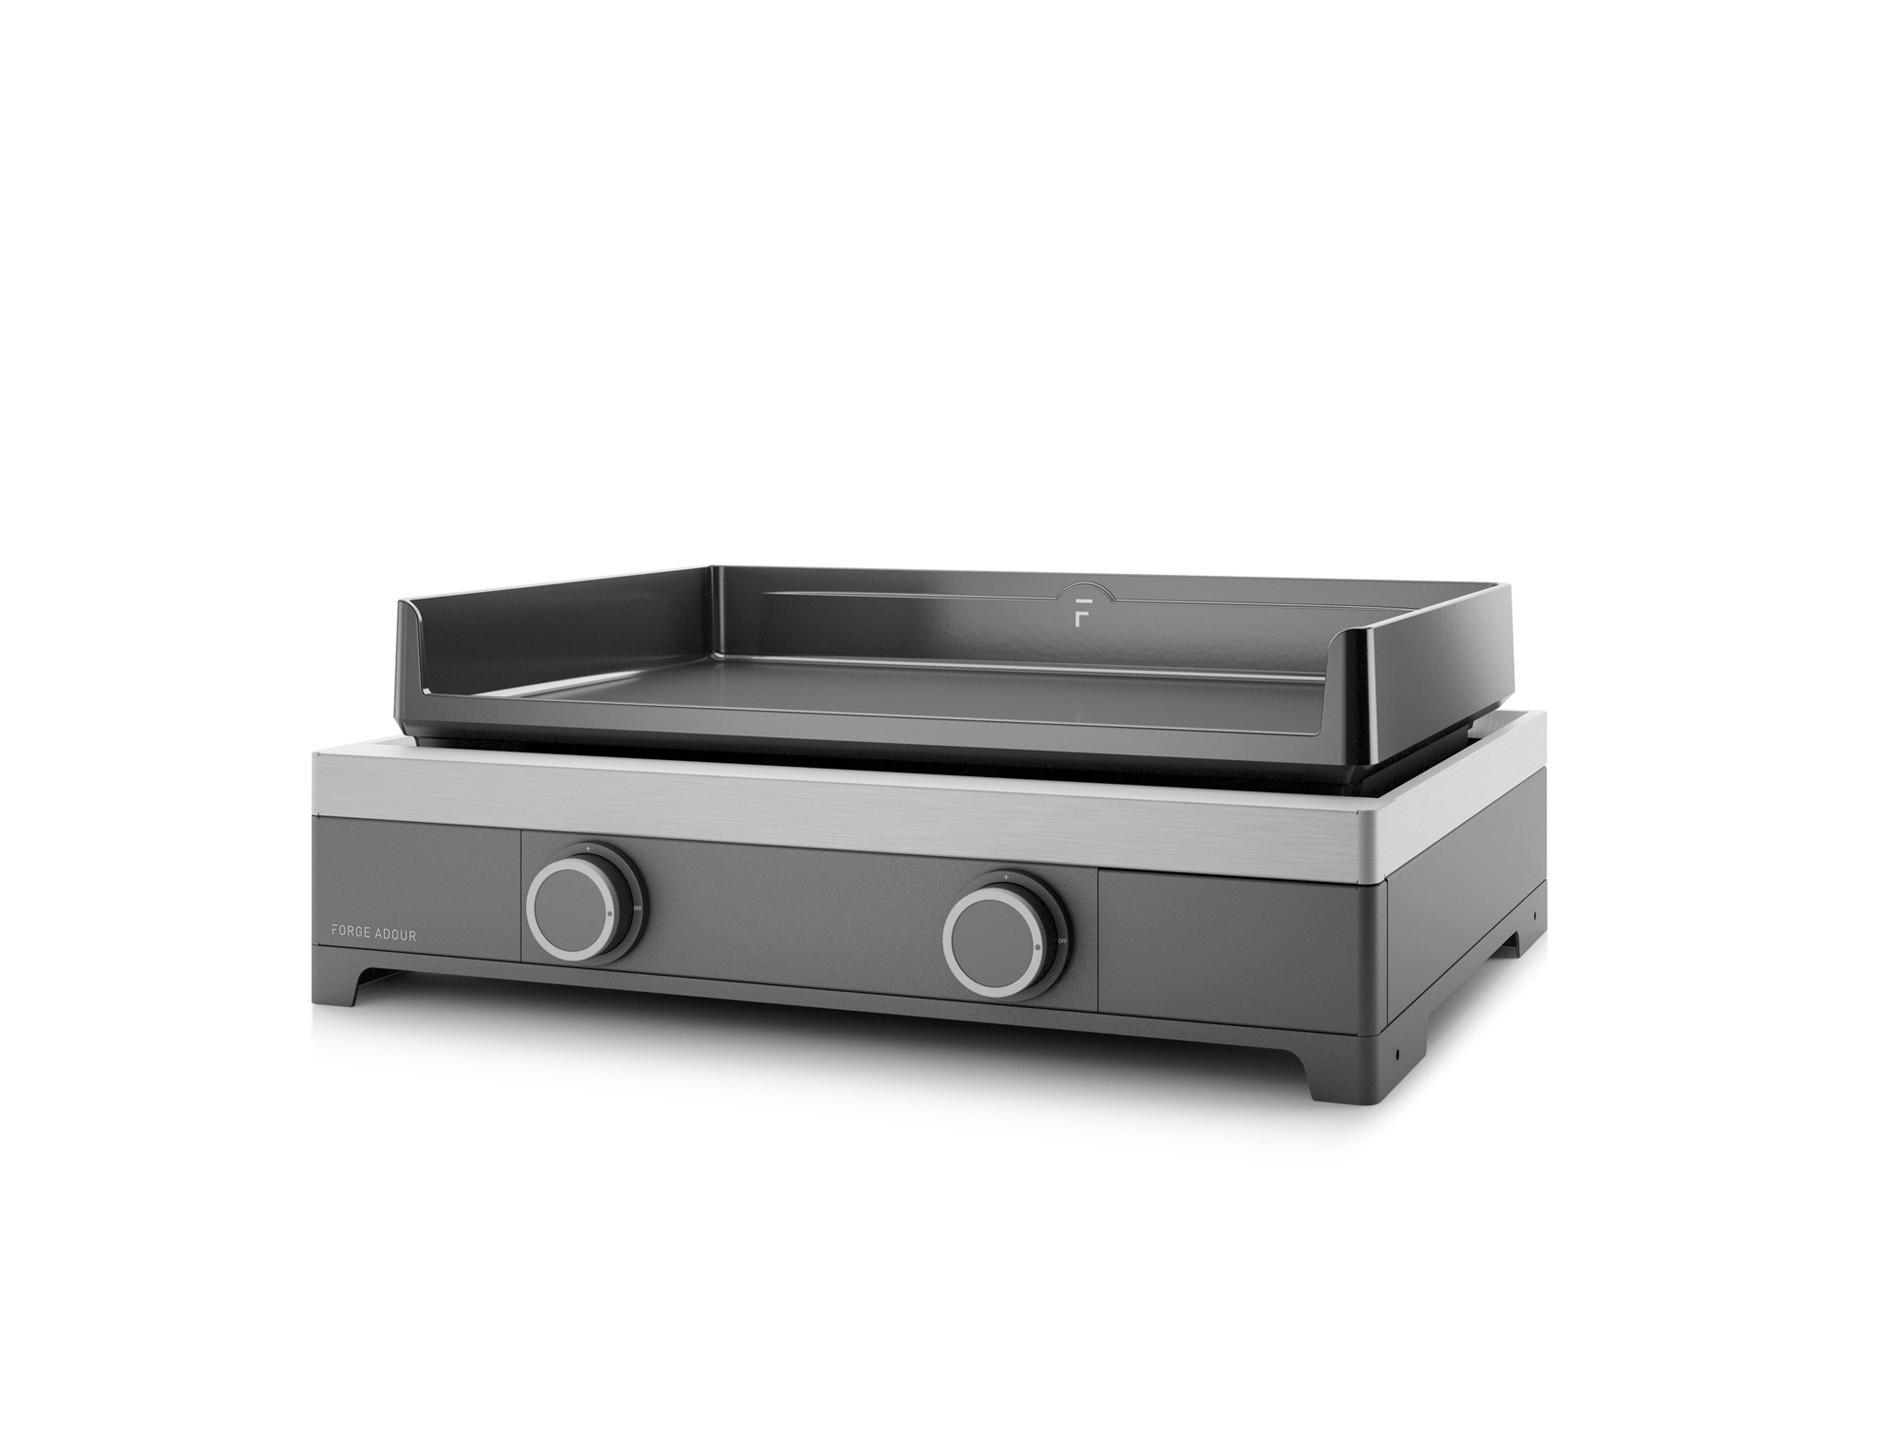 Choisir Une Plancha Professionnelle plancha gaz modern 60 forge adour - barbecue, plancha